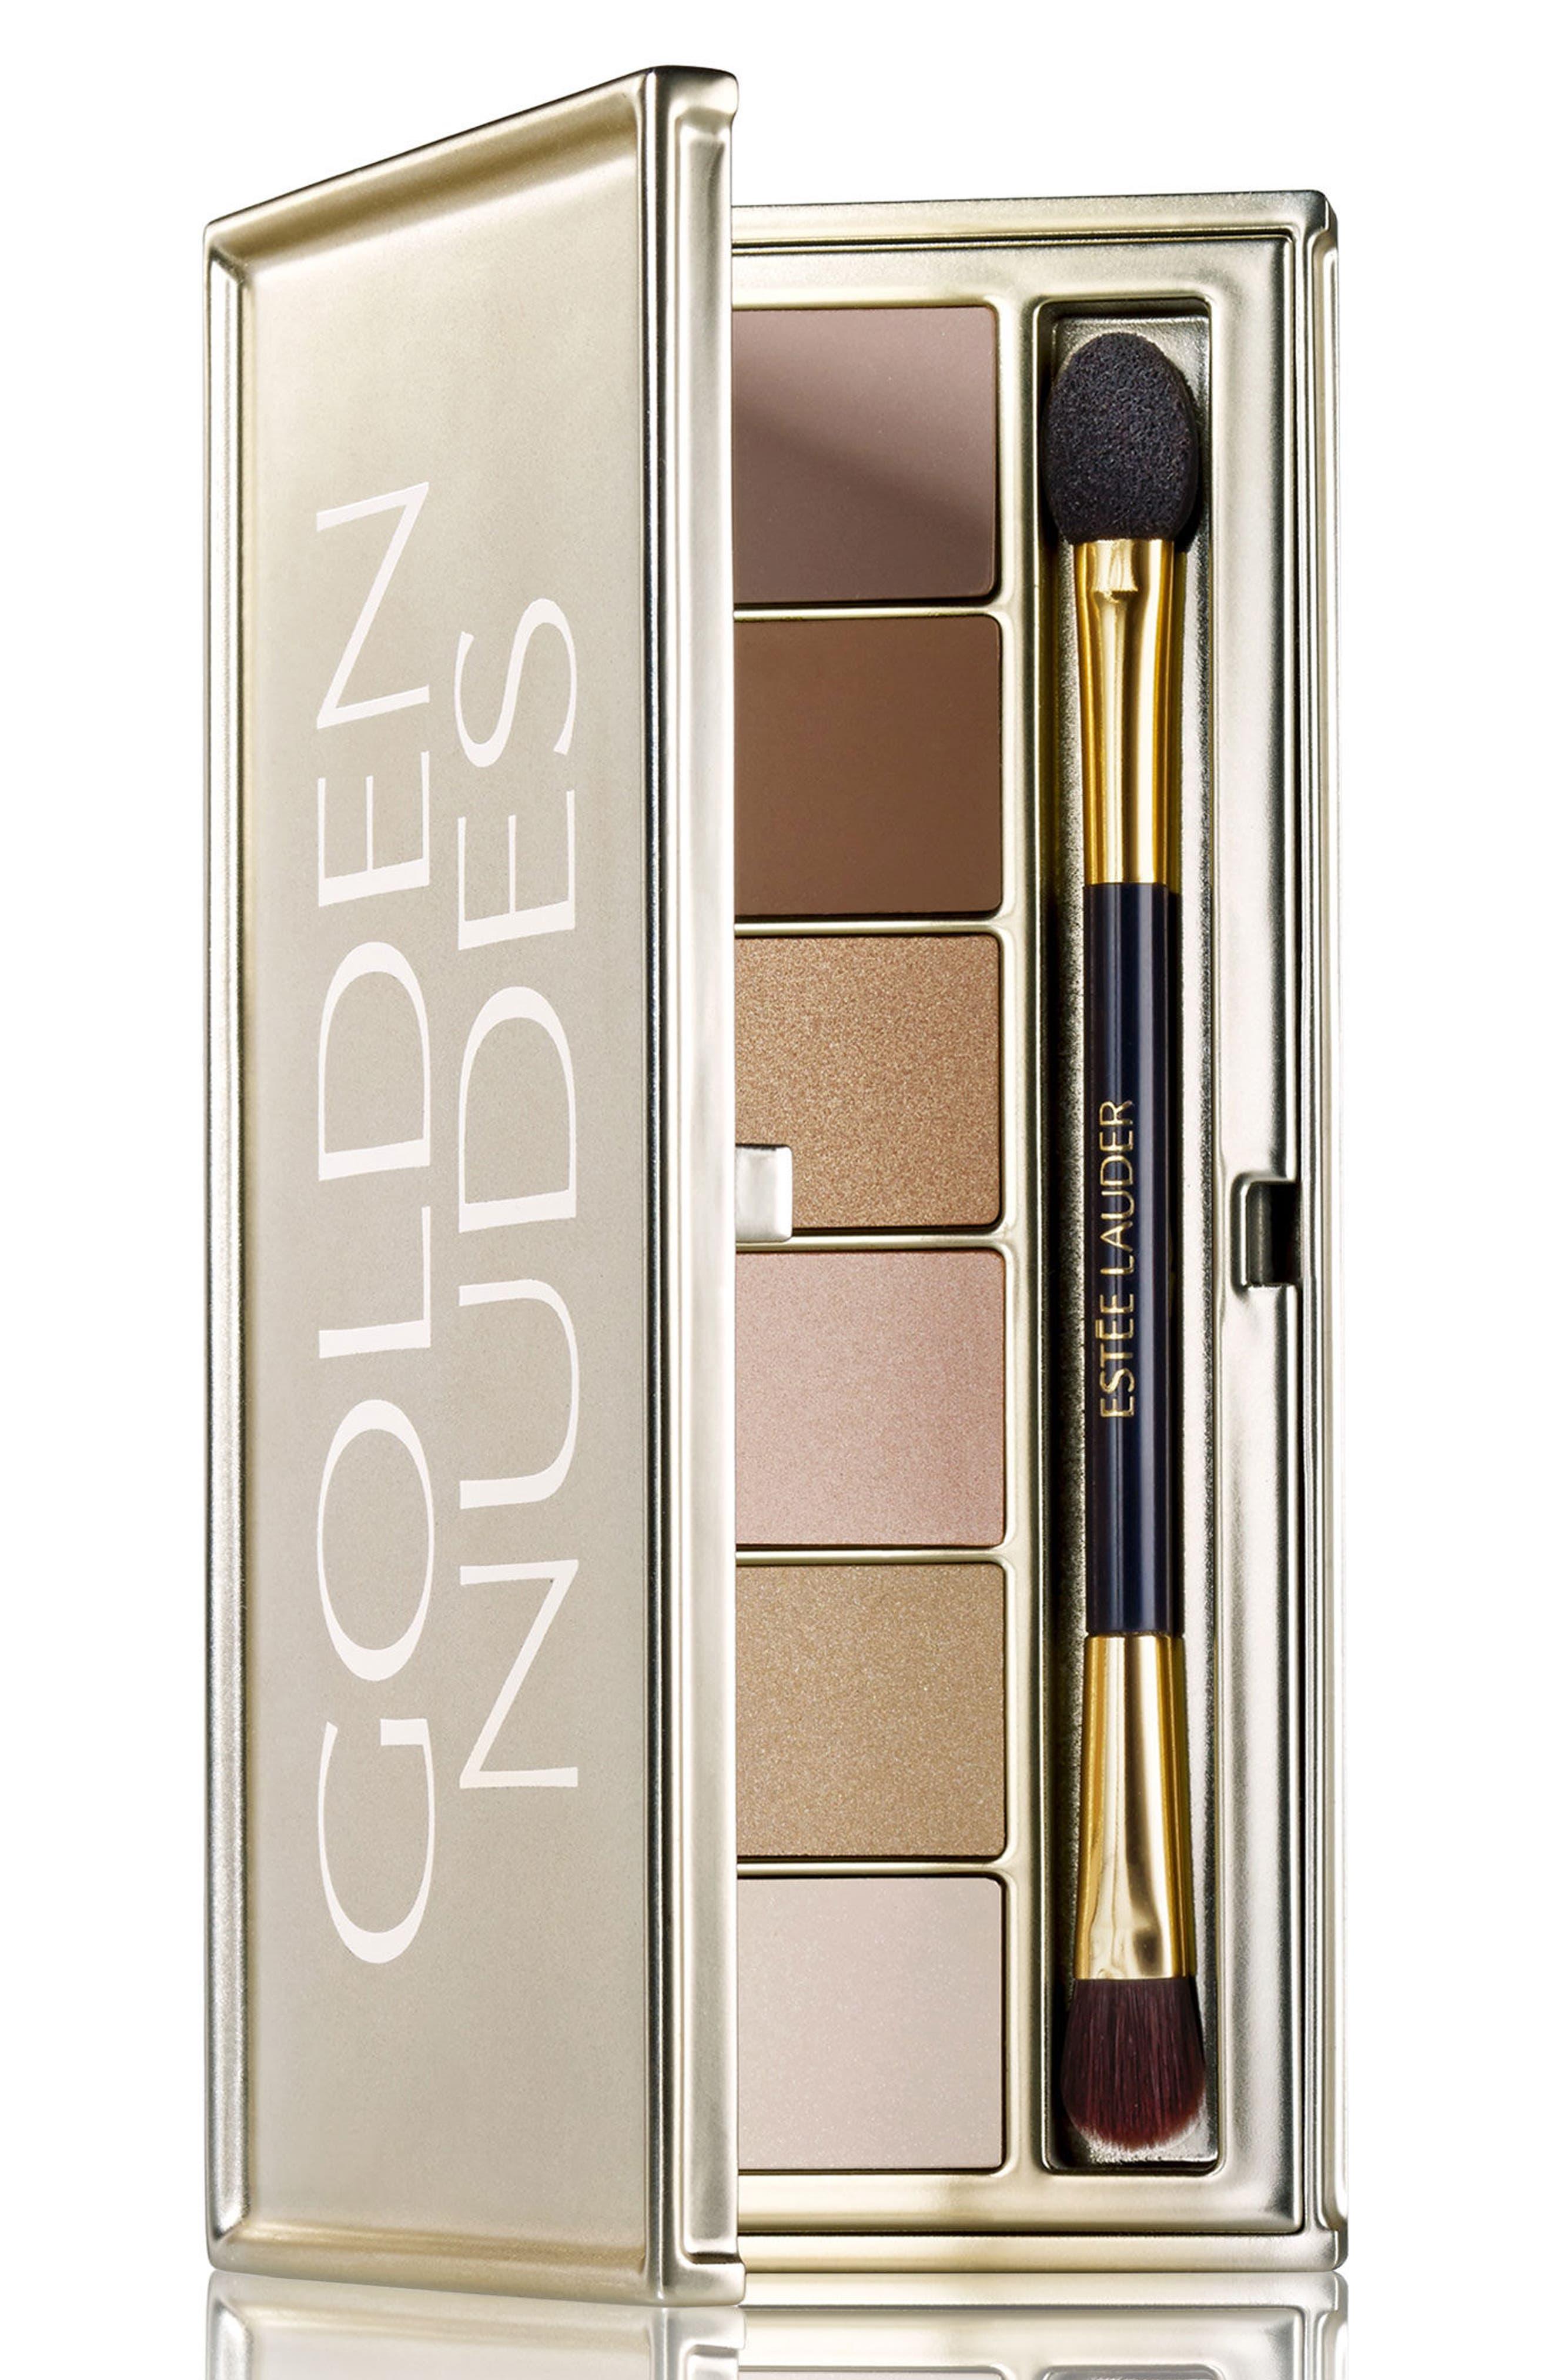 Golden Nudes Eyeshadow Palette,                             Main thumbnail 1, color,                             No Color